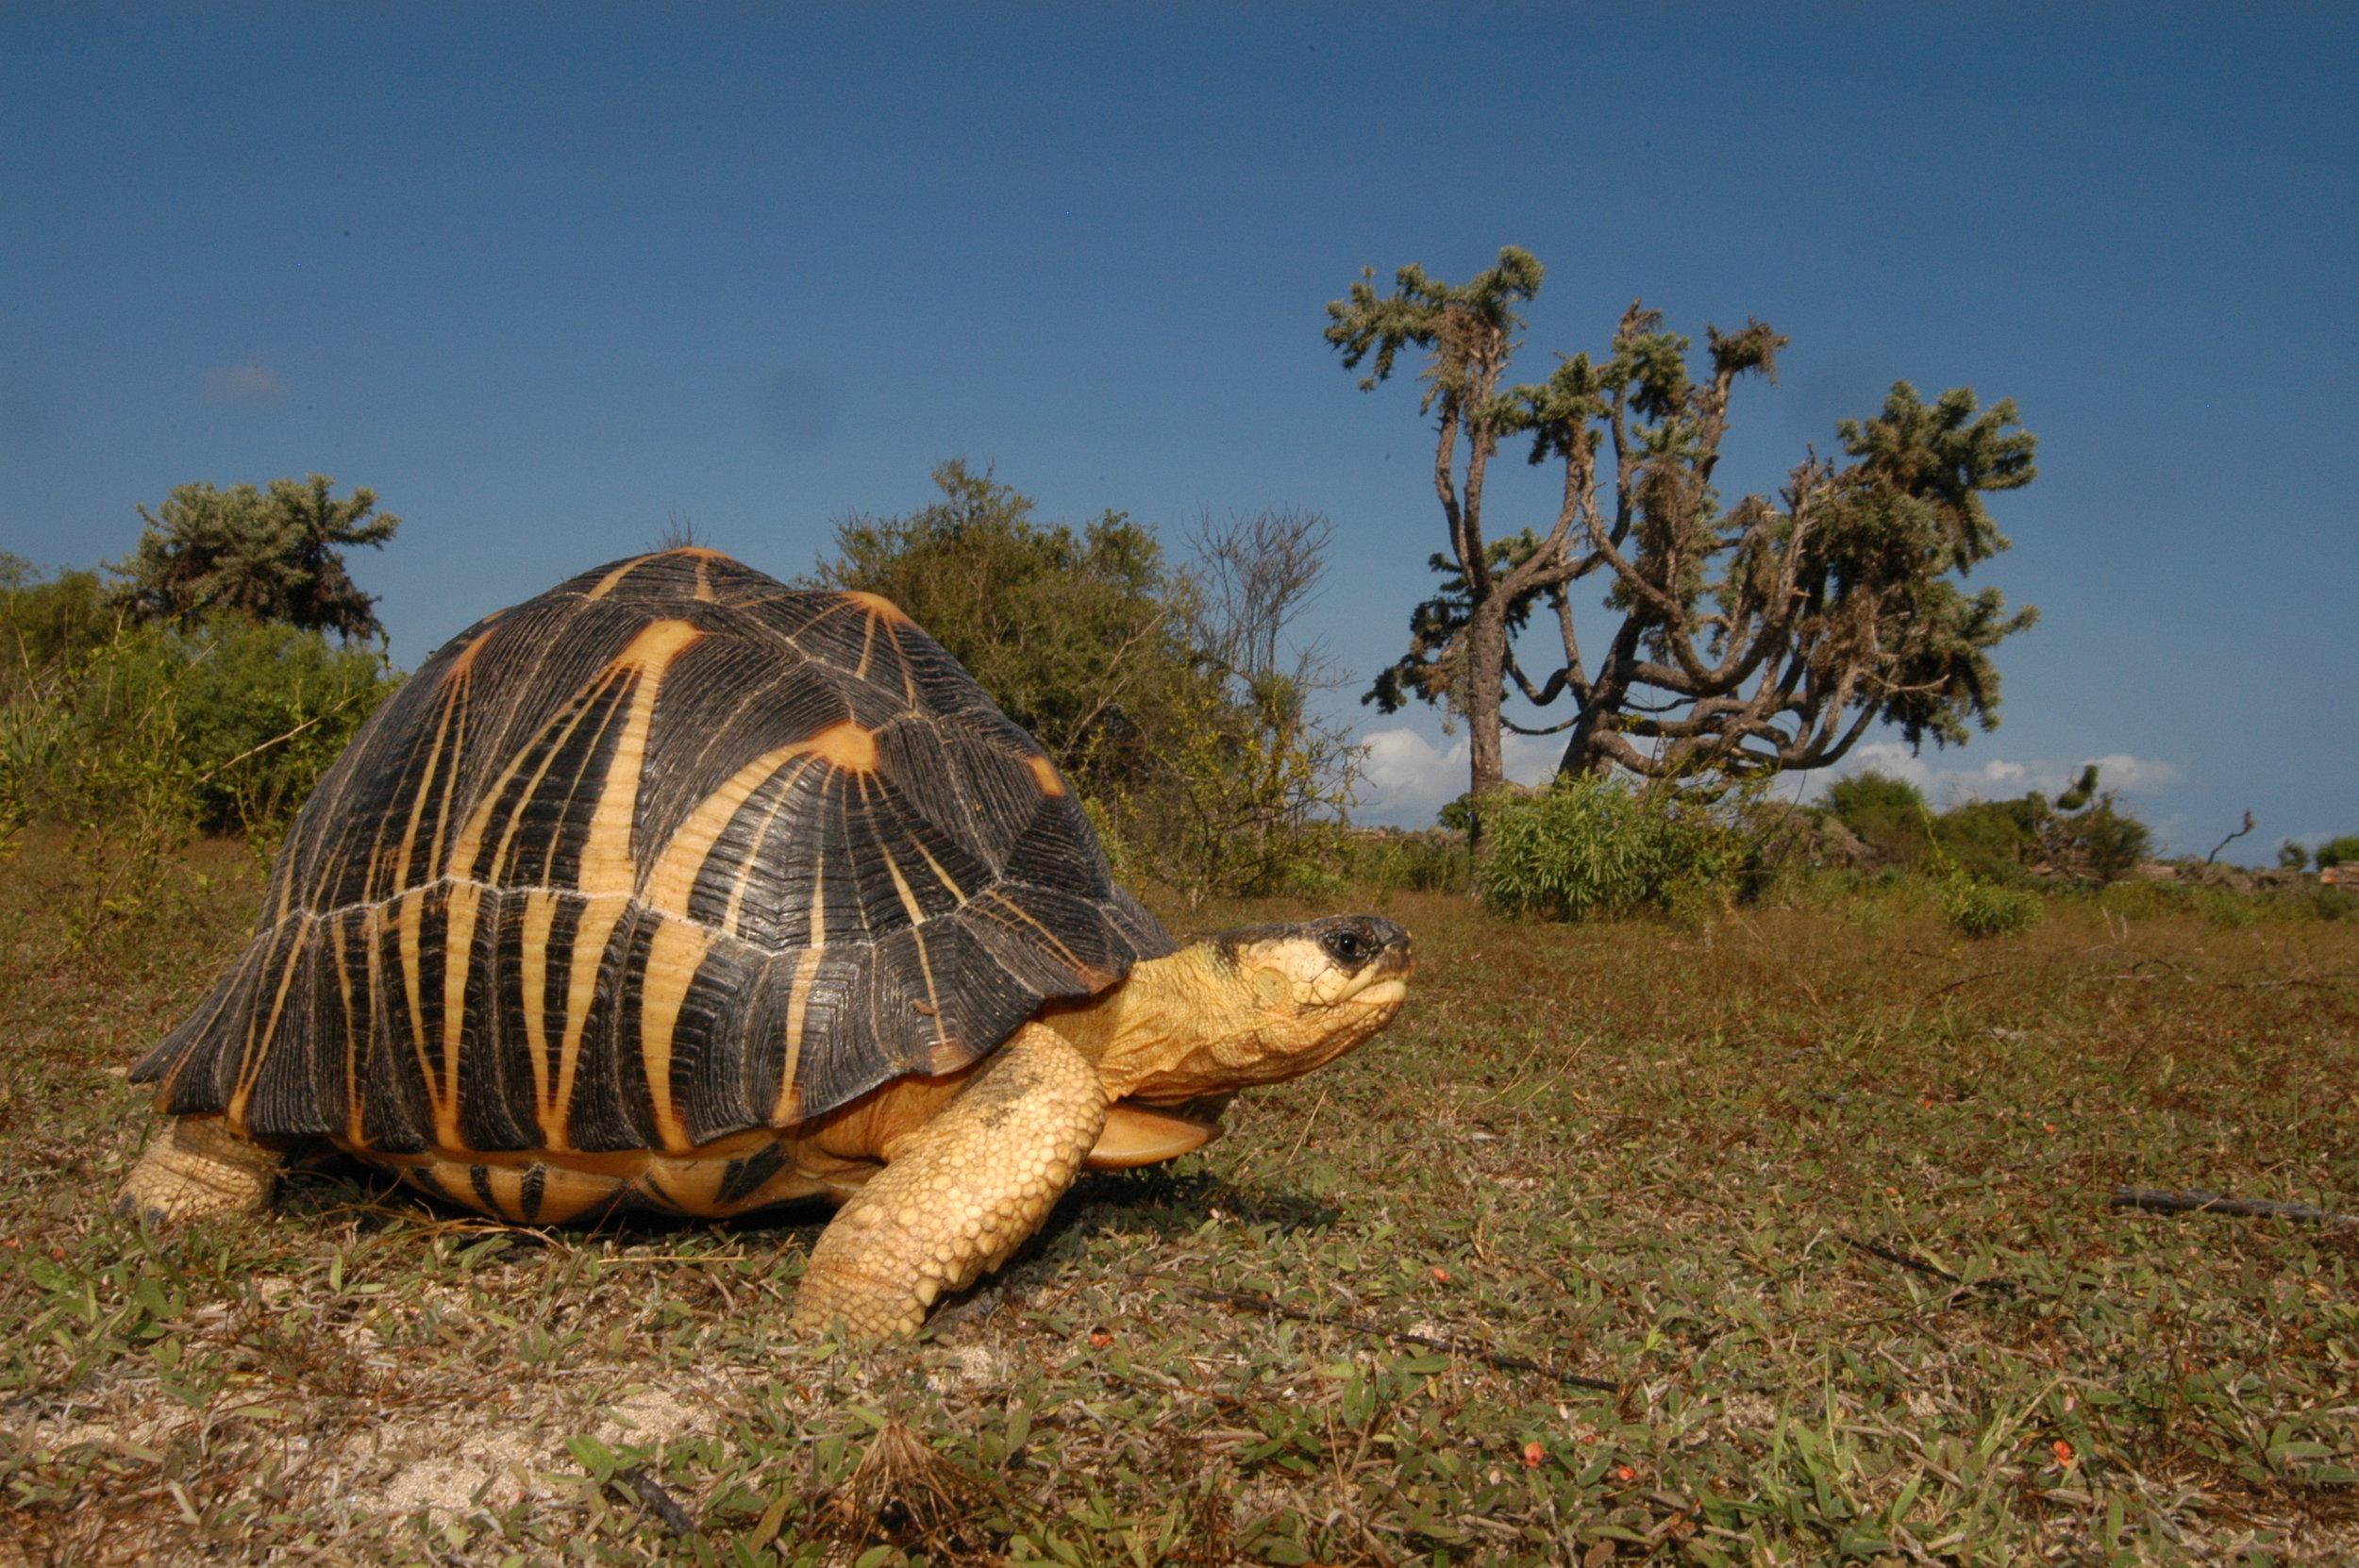 Adulte dans son habitat, Madagascar ©Franck Bonin